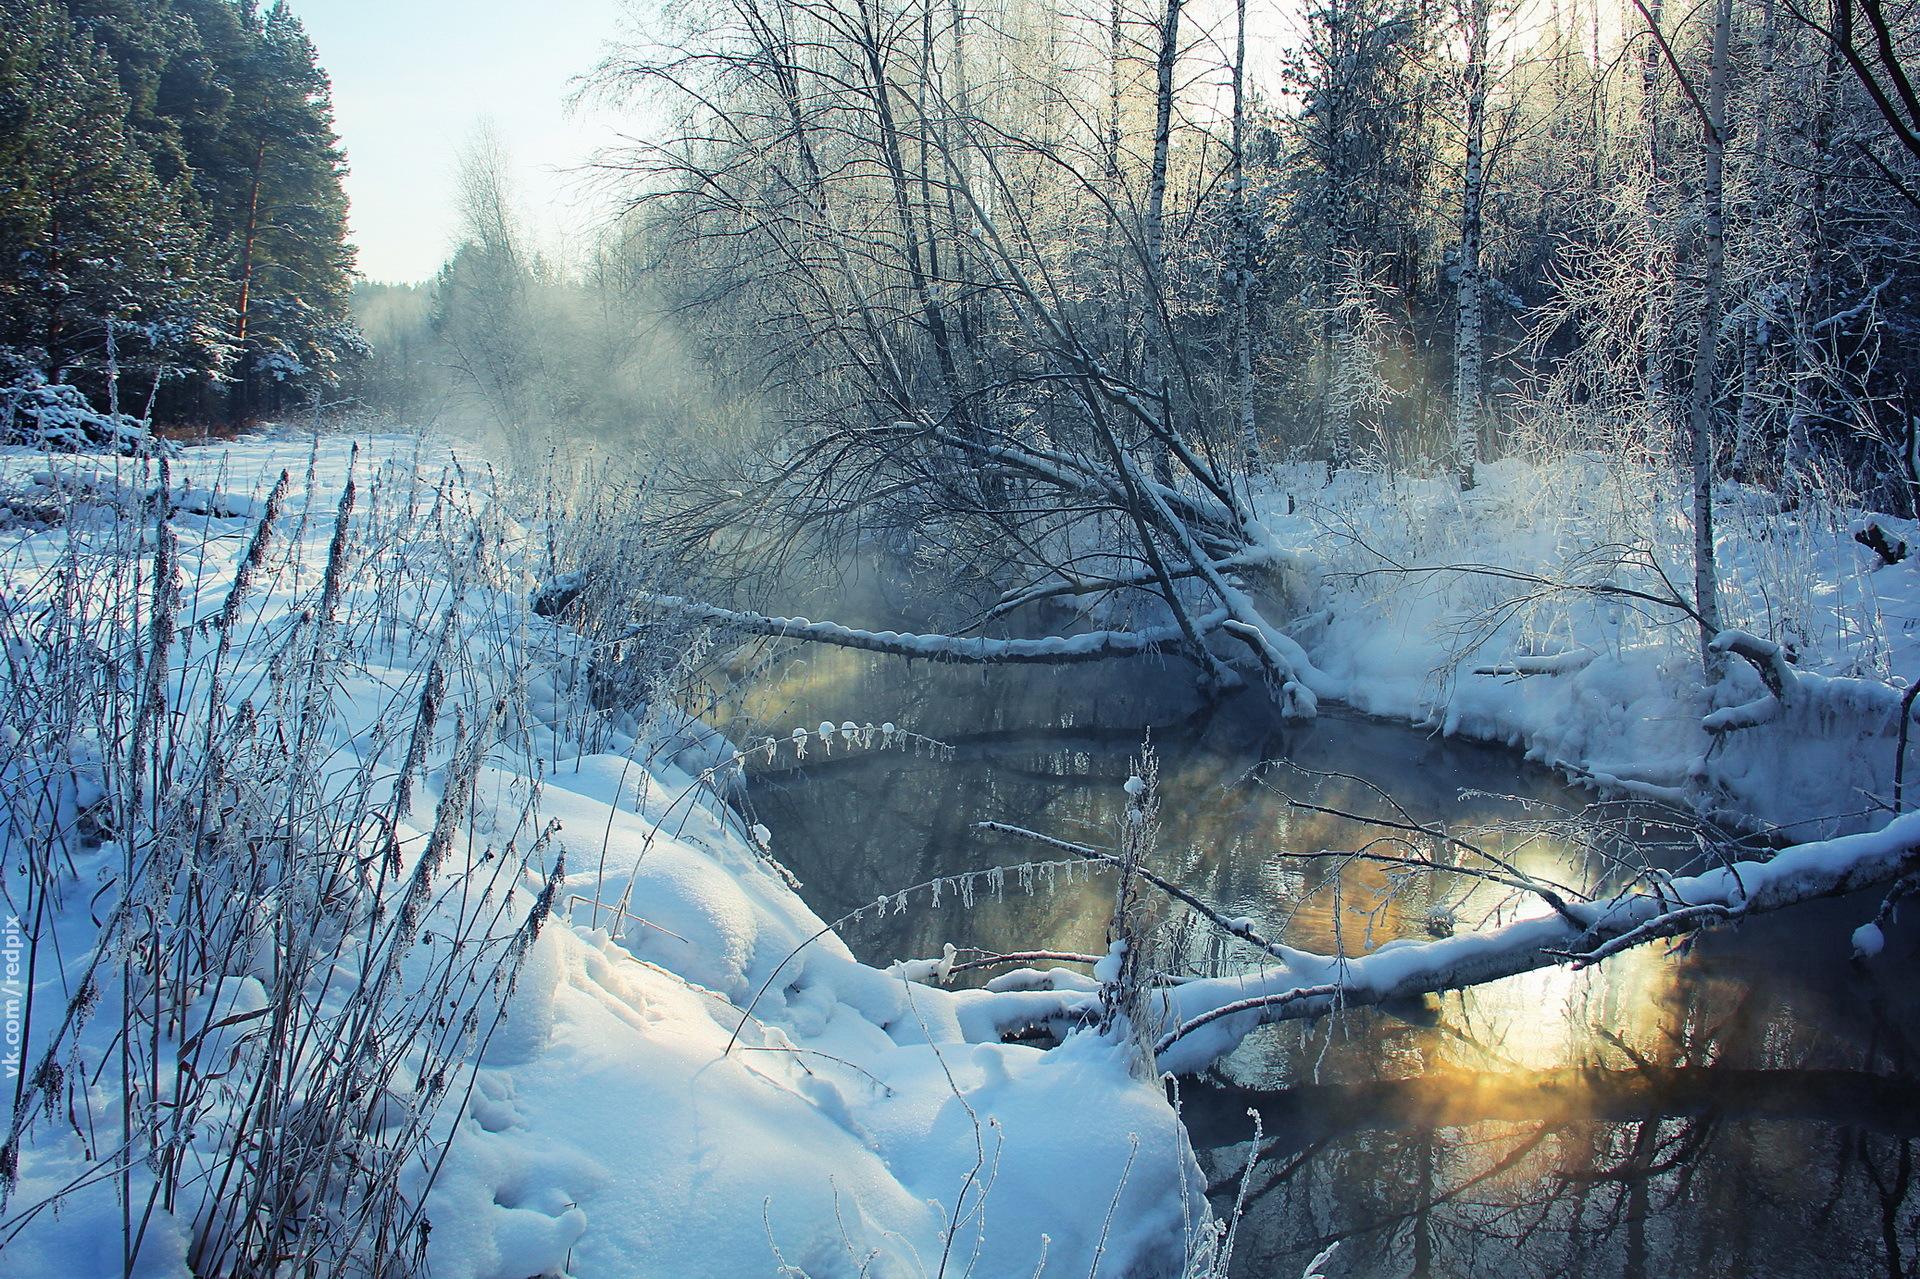 речка мороз зима the river frost winter  № 456282  скачать